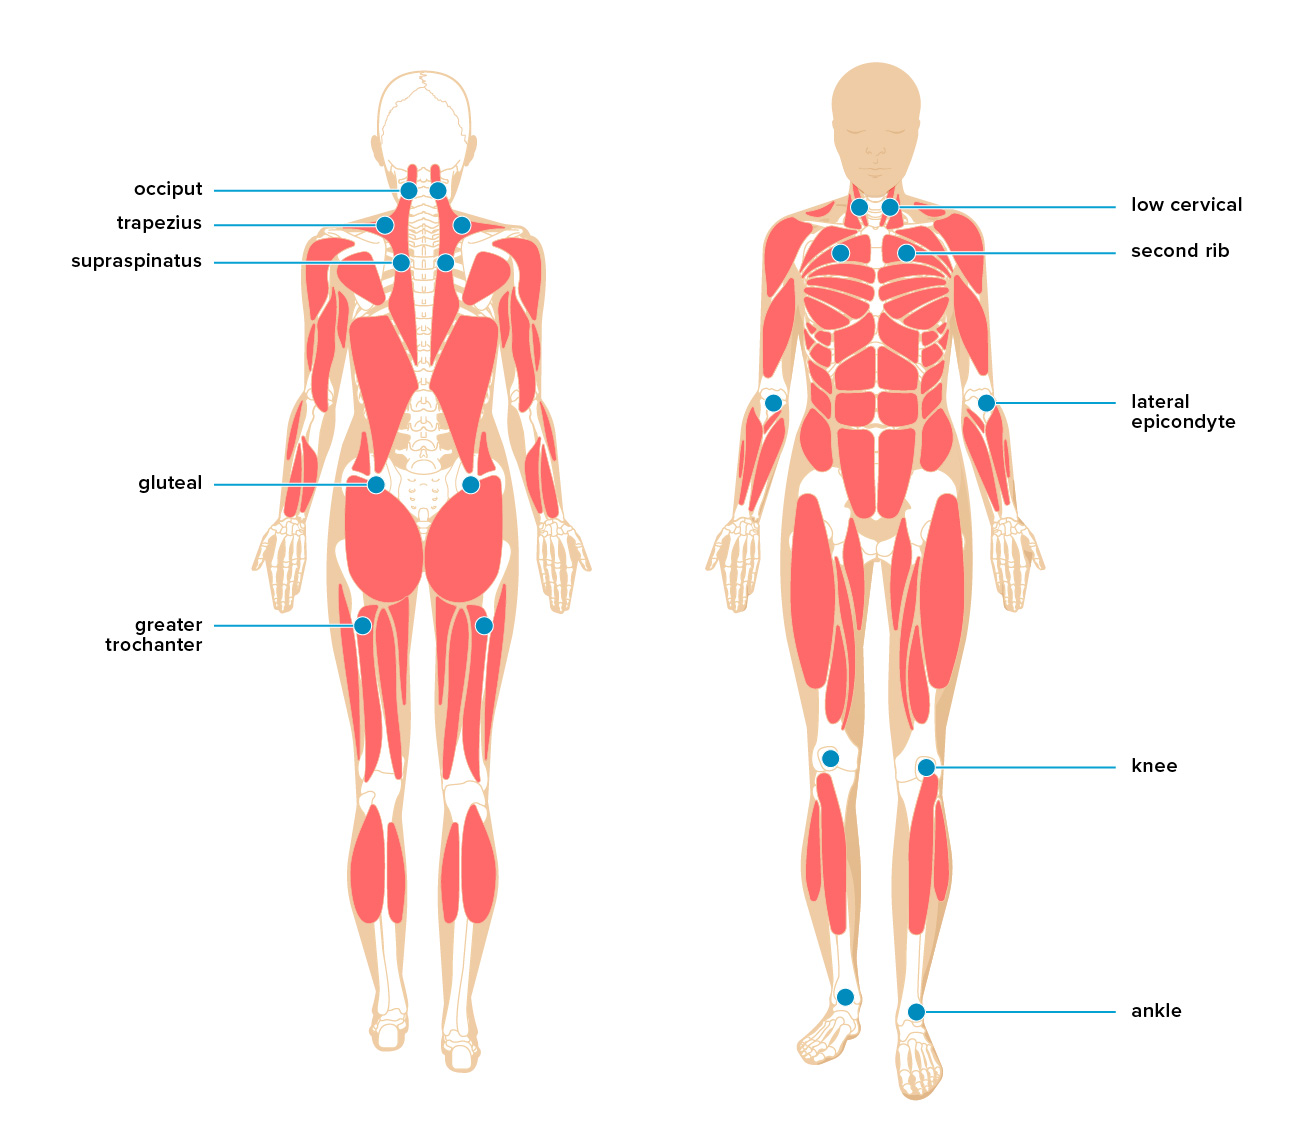 myofascial pain treatment, symptoms, causes, and more Fibromyalgia Pain Diagram